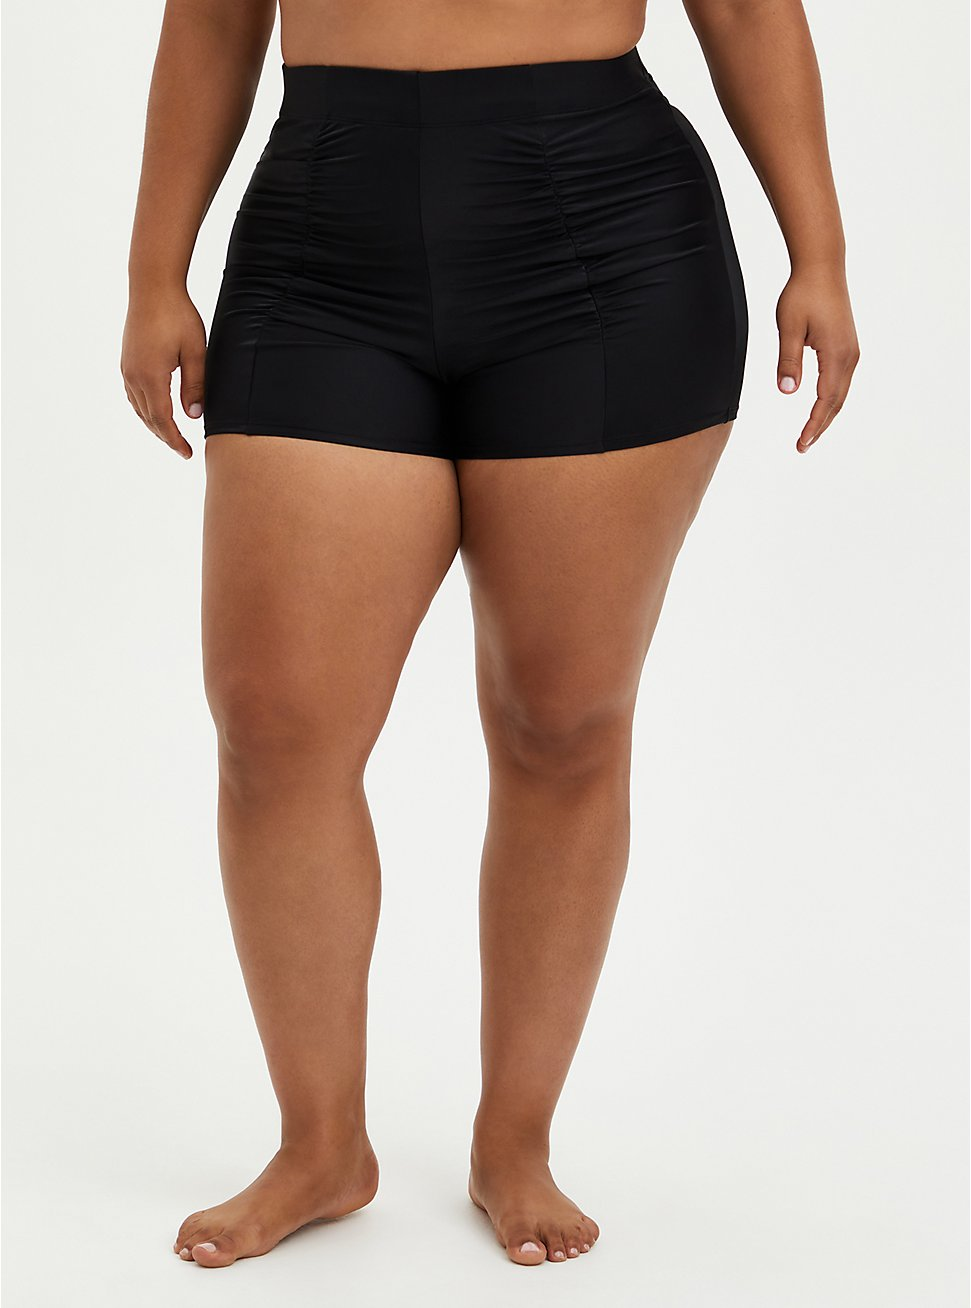 Ultra High Ruched Swim Short - Black, , fitModel1-hires